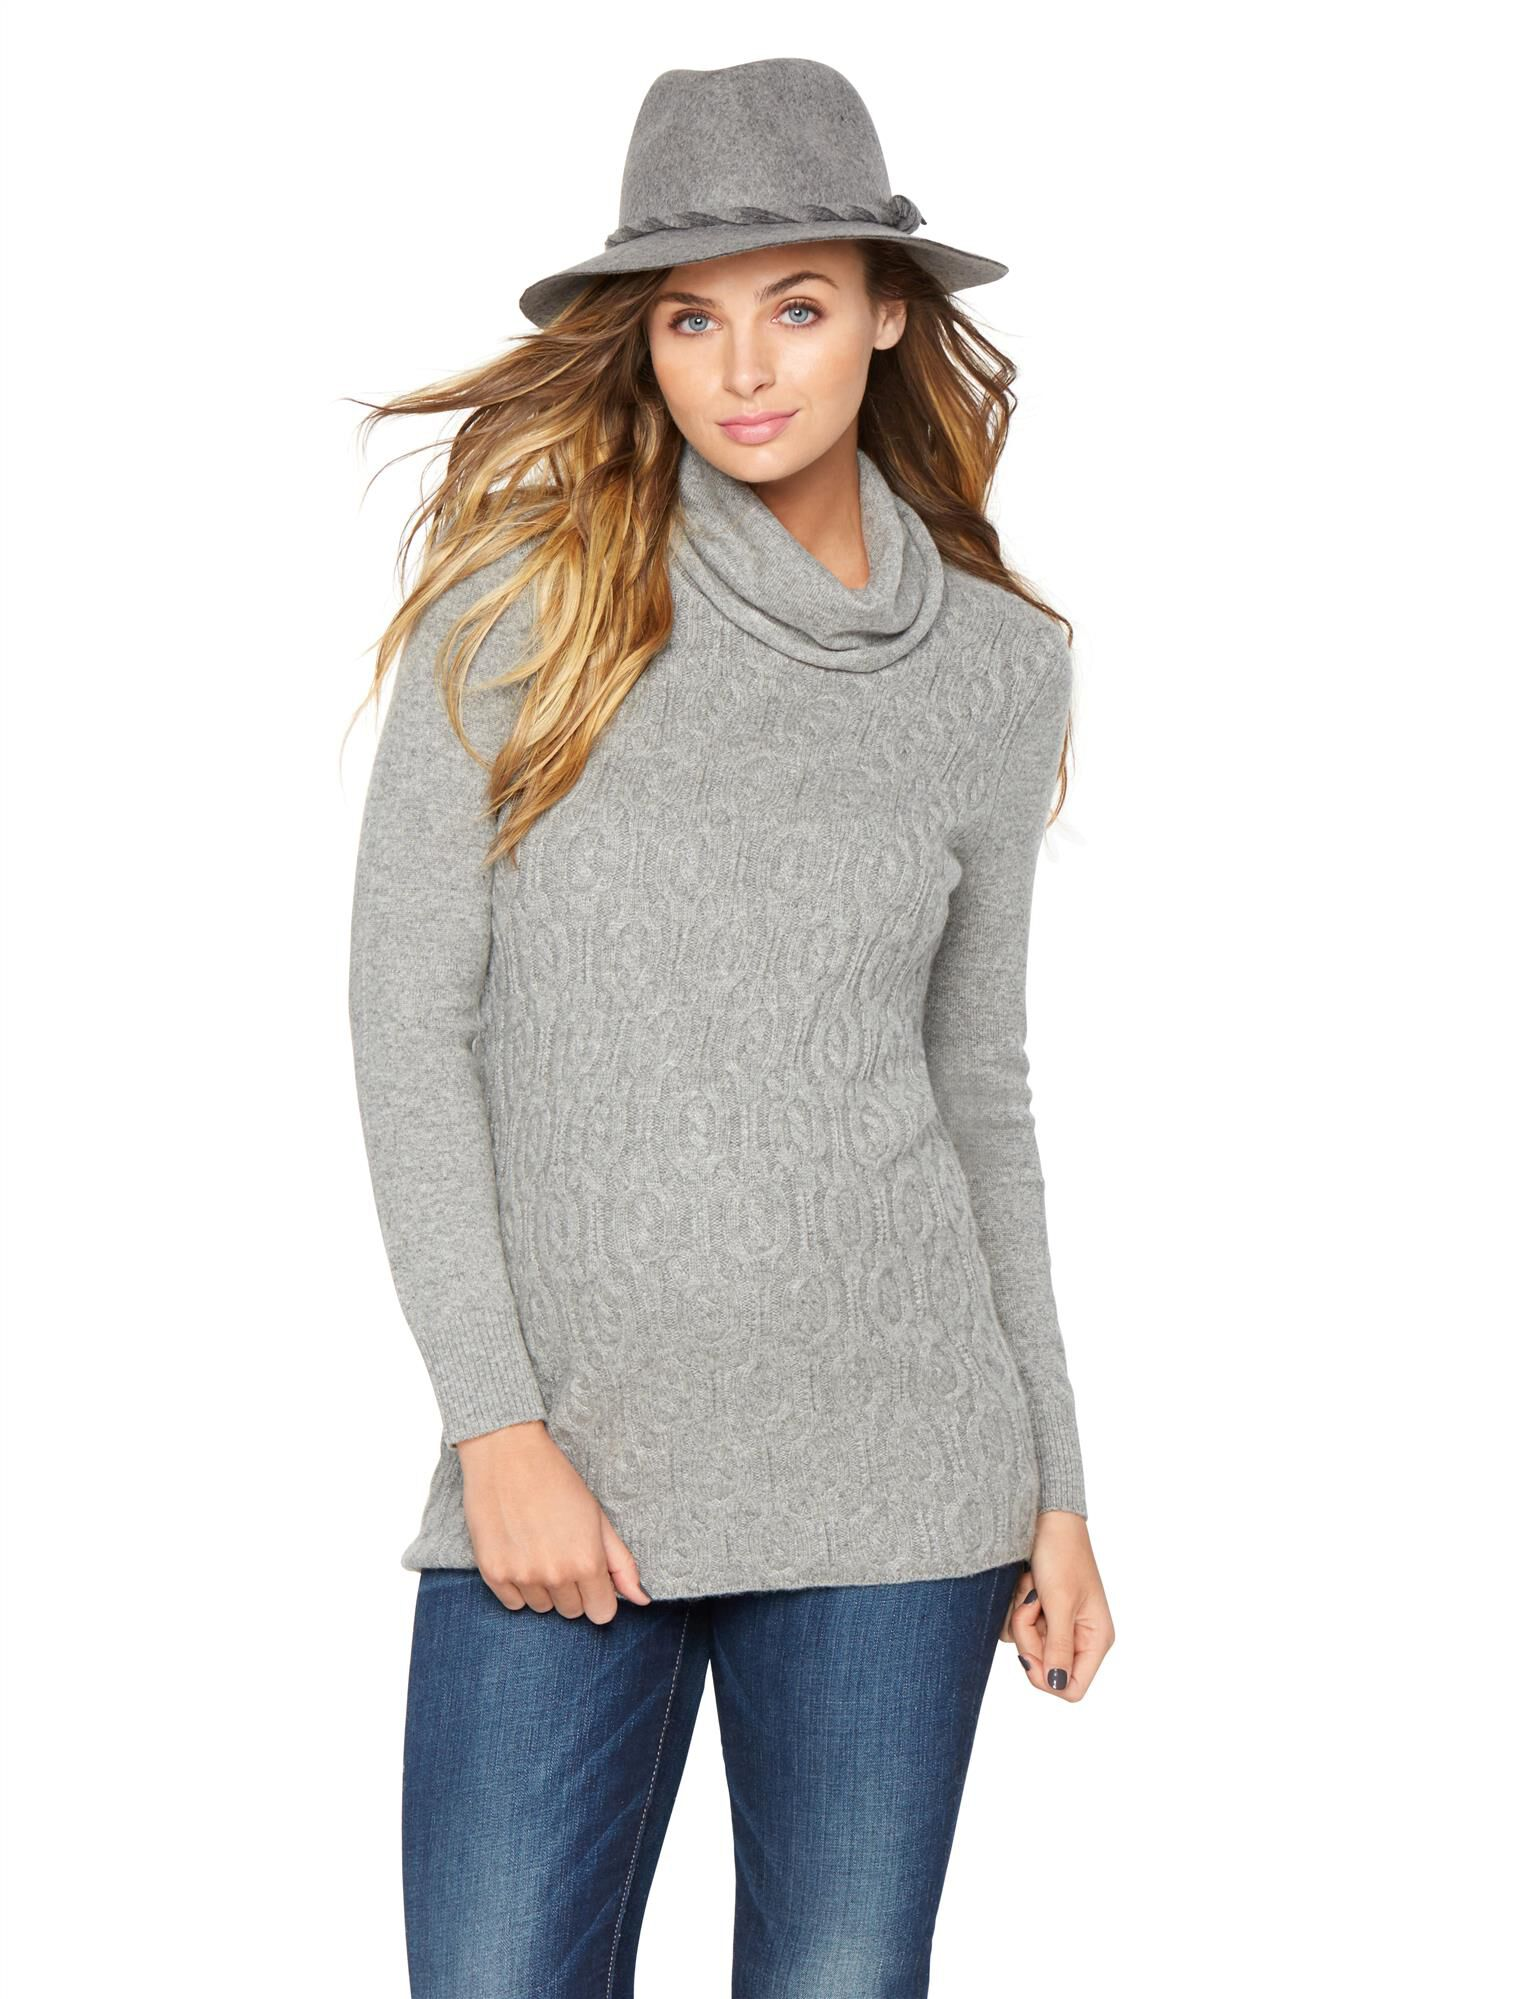 Quinn Cable Cotton Cashmere Turtleneck Maternity Sweater